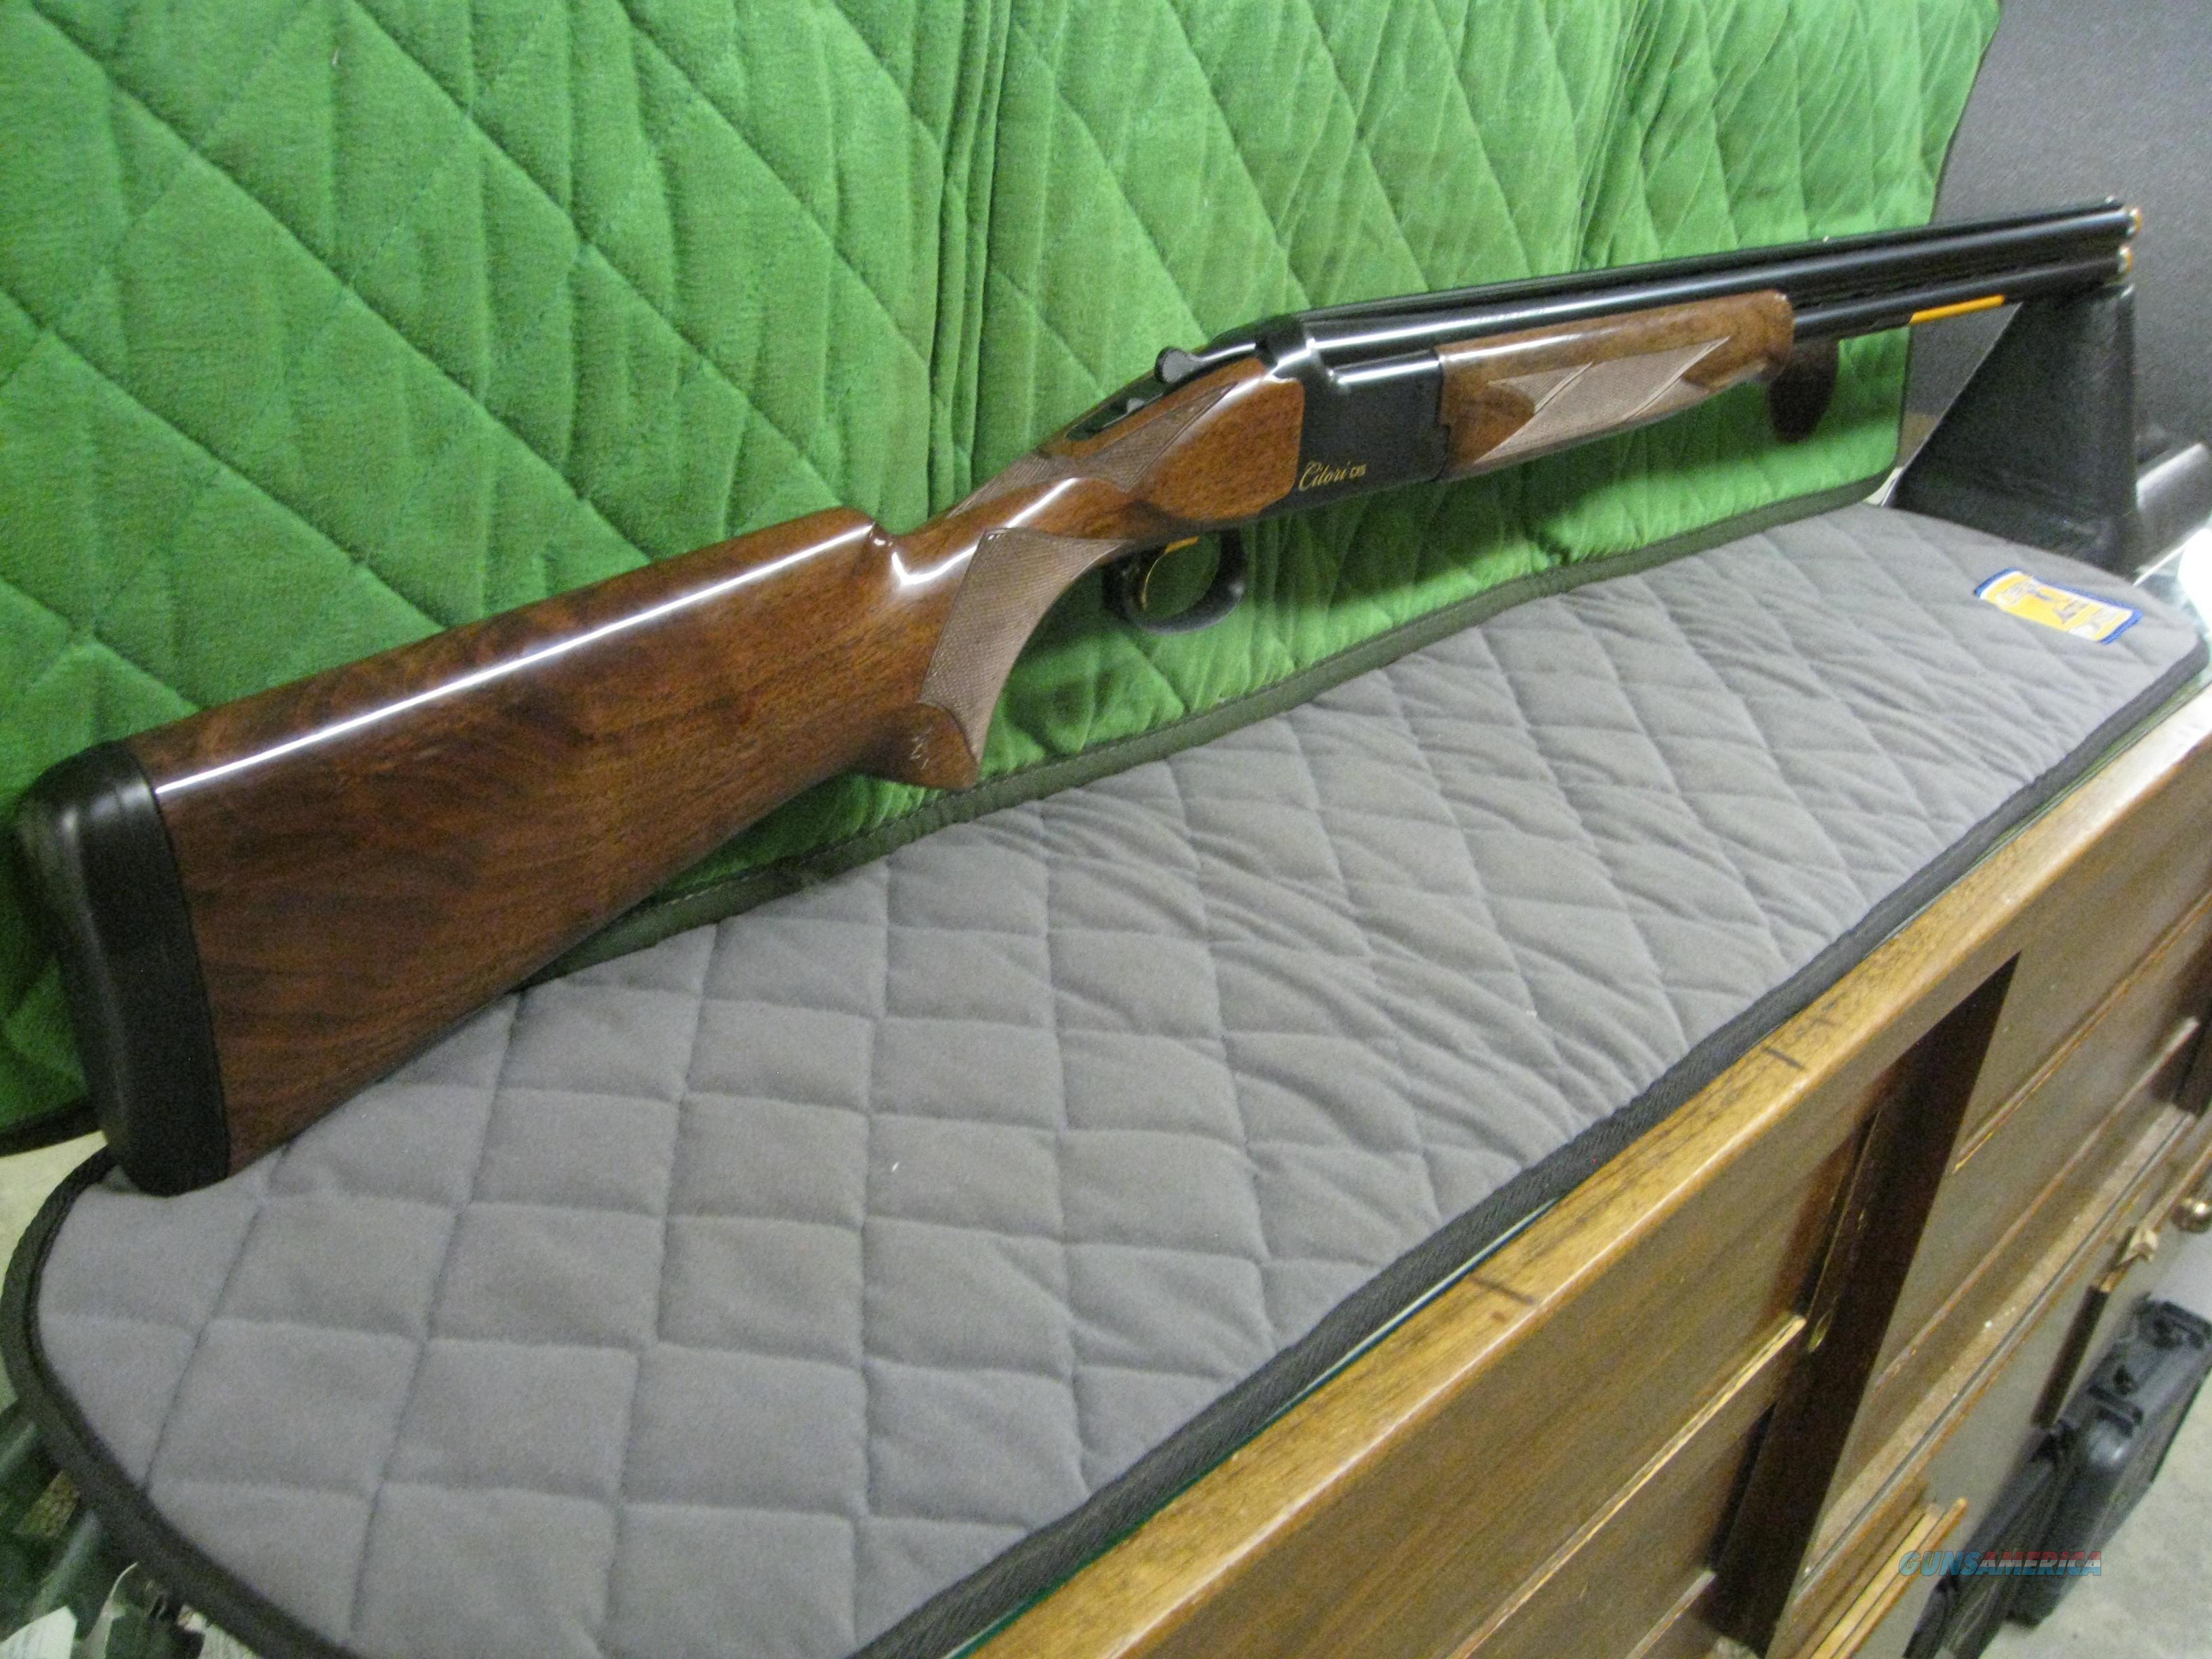 Browning Citori CXS 28 Inch  **NO CC FEES** 018073304  Guns > Shotguns > Browning Shotguns > Over Unders > Citori > Trap/Skeet